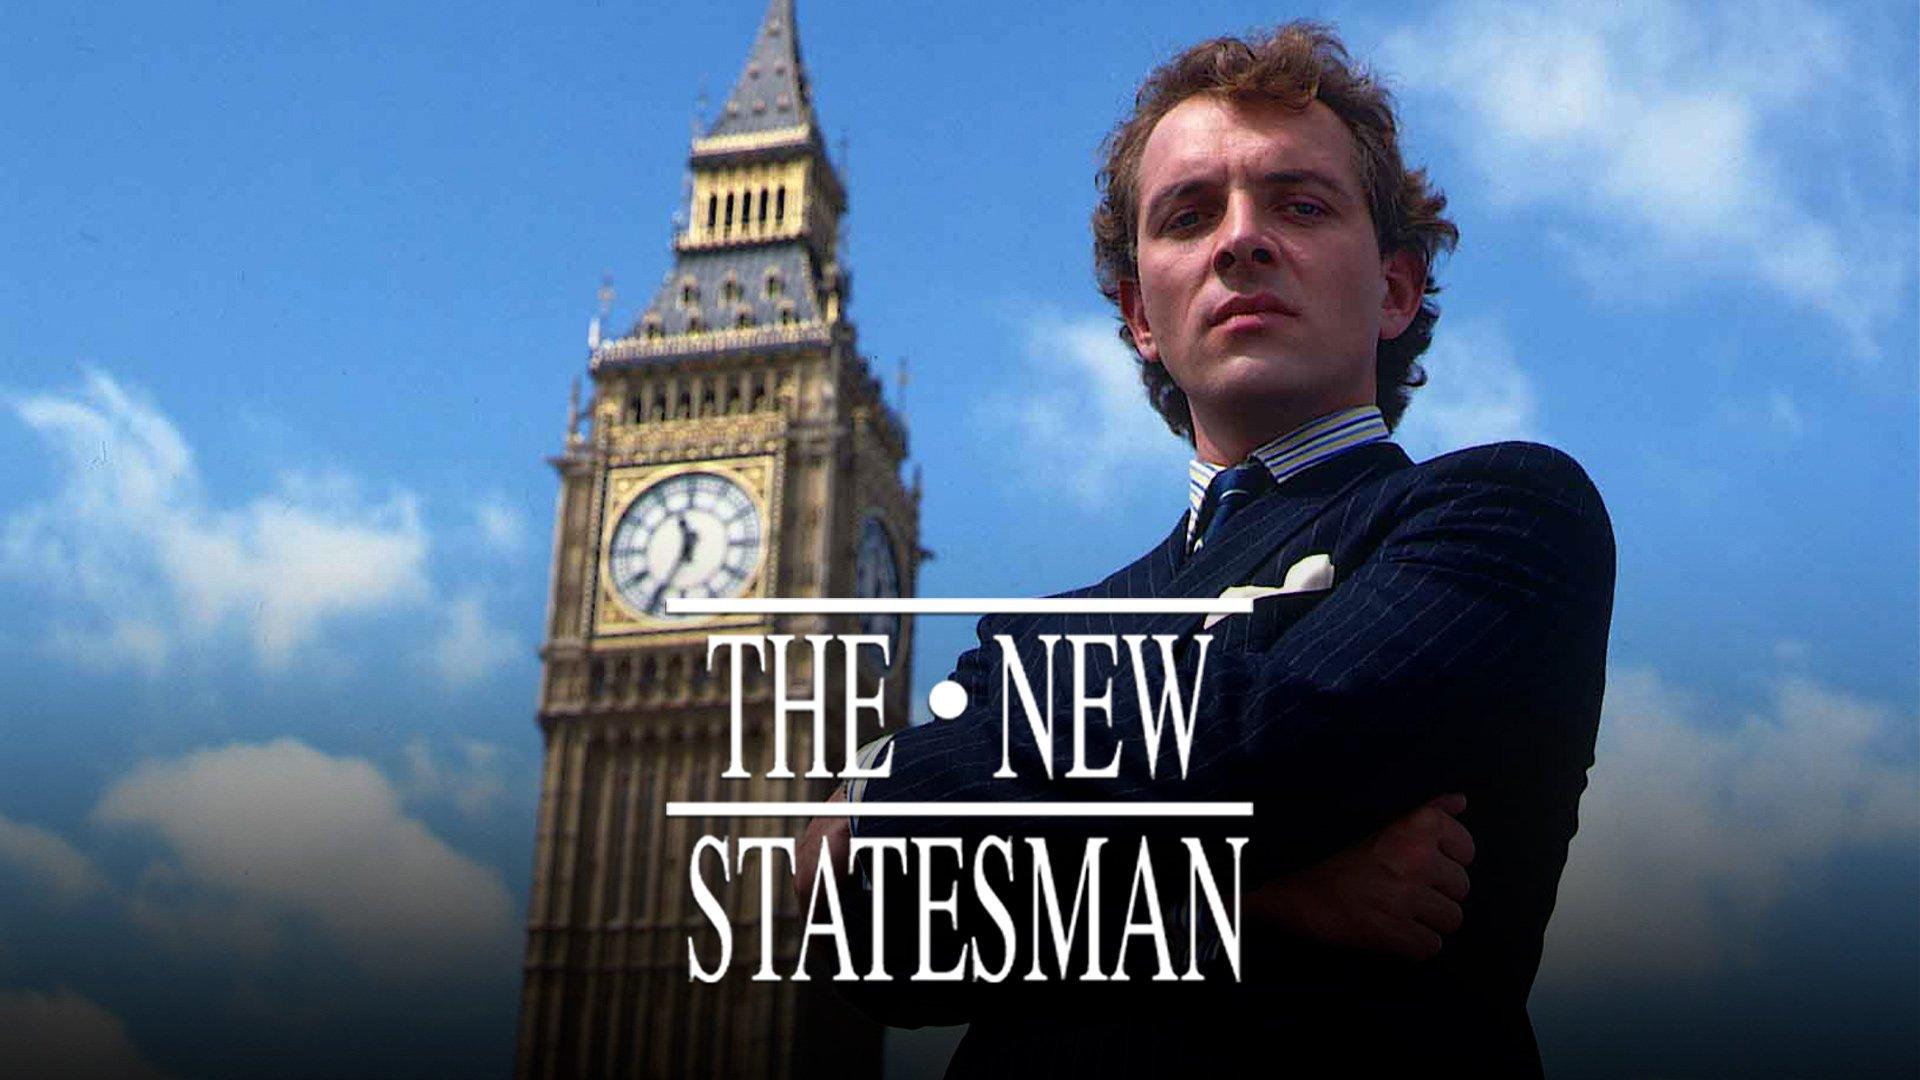 The New Statesman on BritBox UK